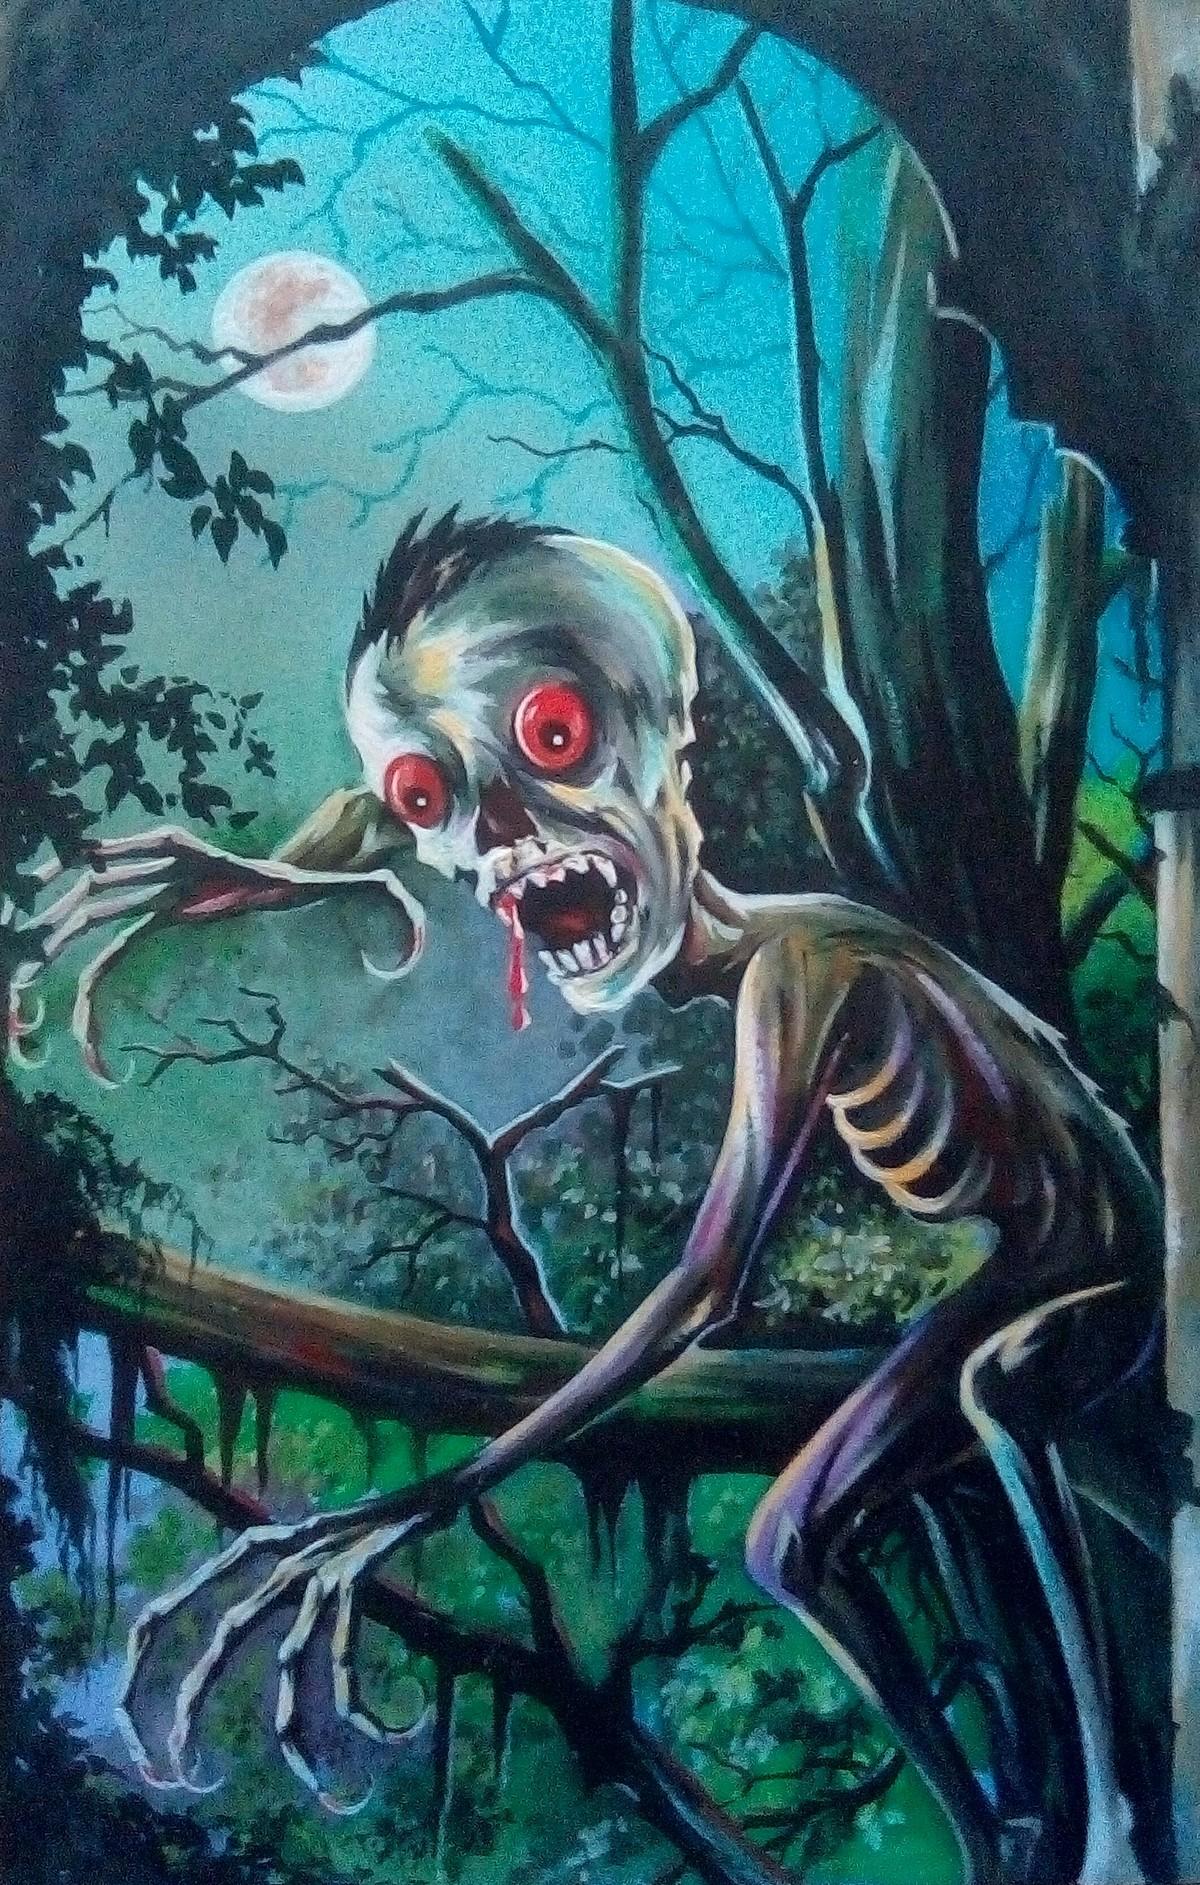 Dangerous Mamdo by Subhasis Palodhi, Conceptual, Fantasy Painting, Mixed Media on Paper, Te Papa Green color